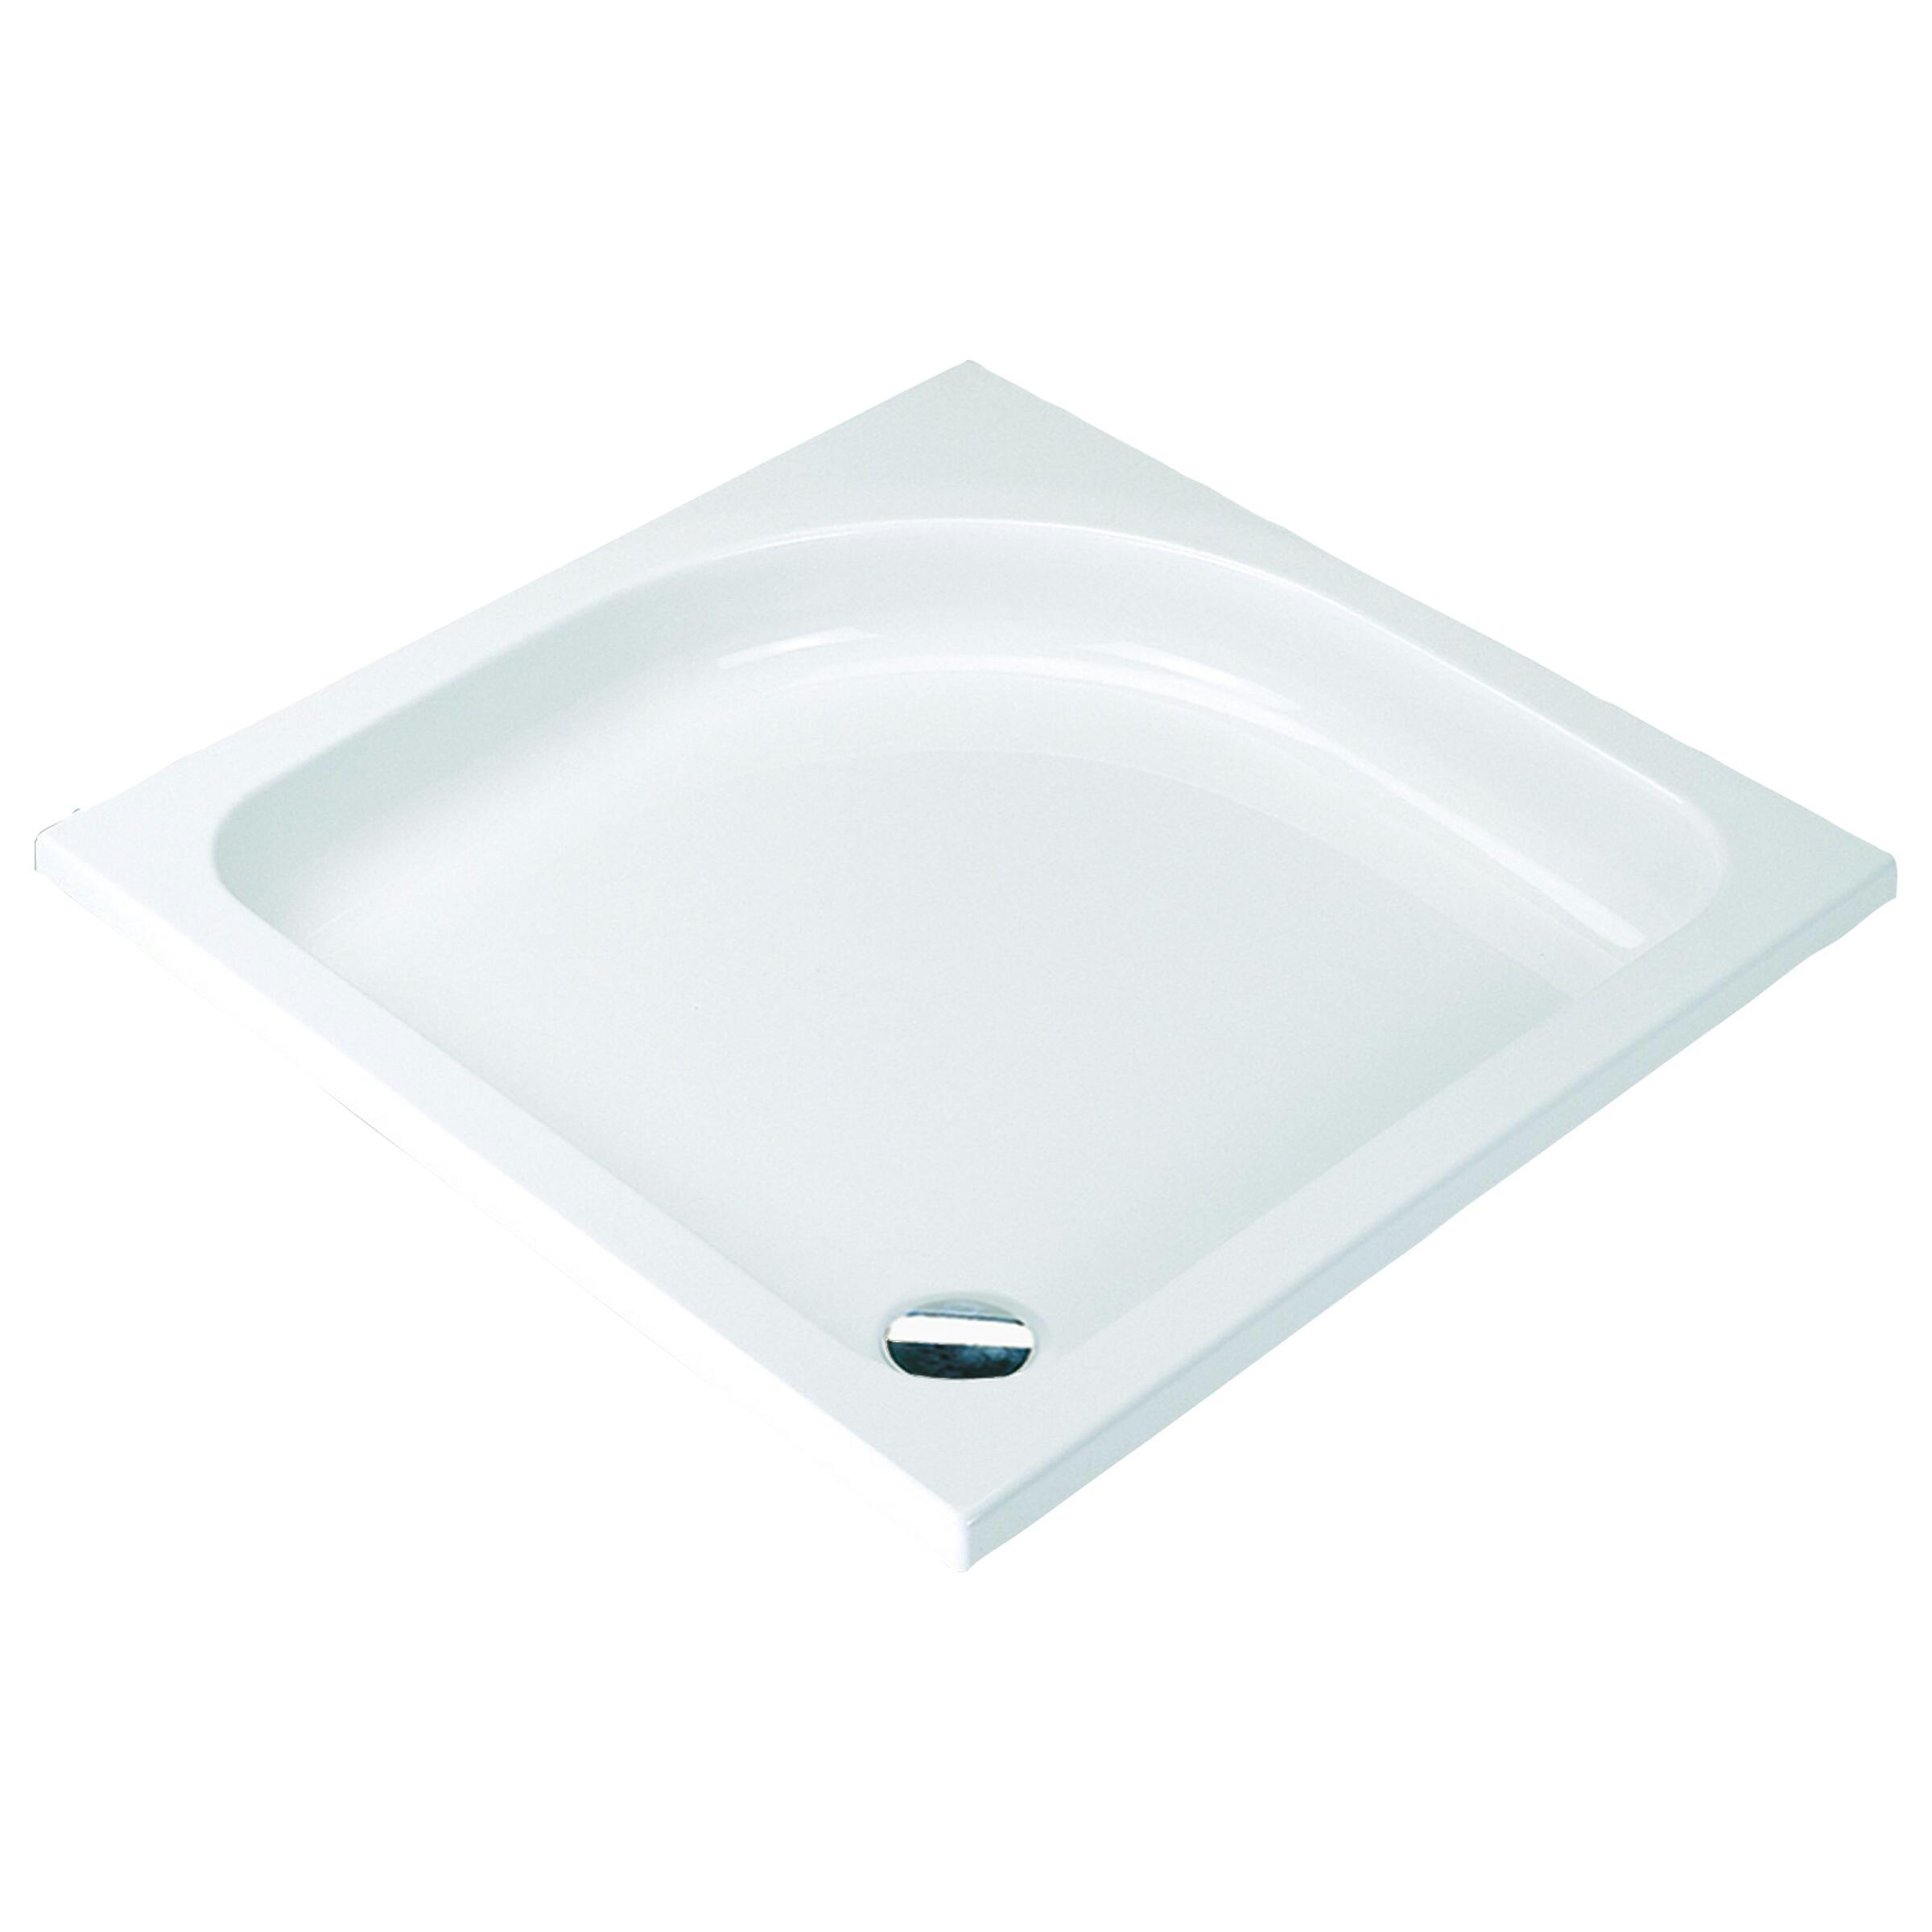 Sealskin Comfort douchebak vierkant 80x80 inbouw wit